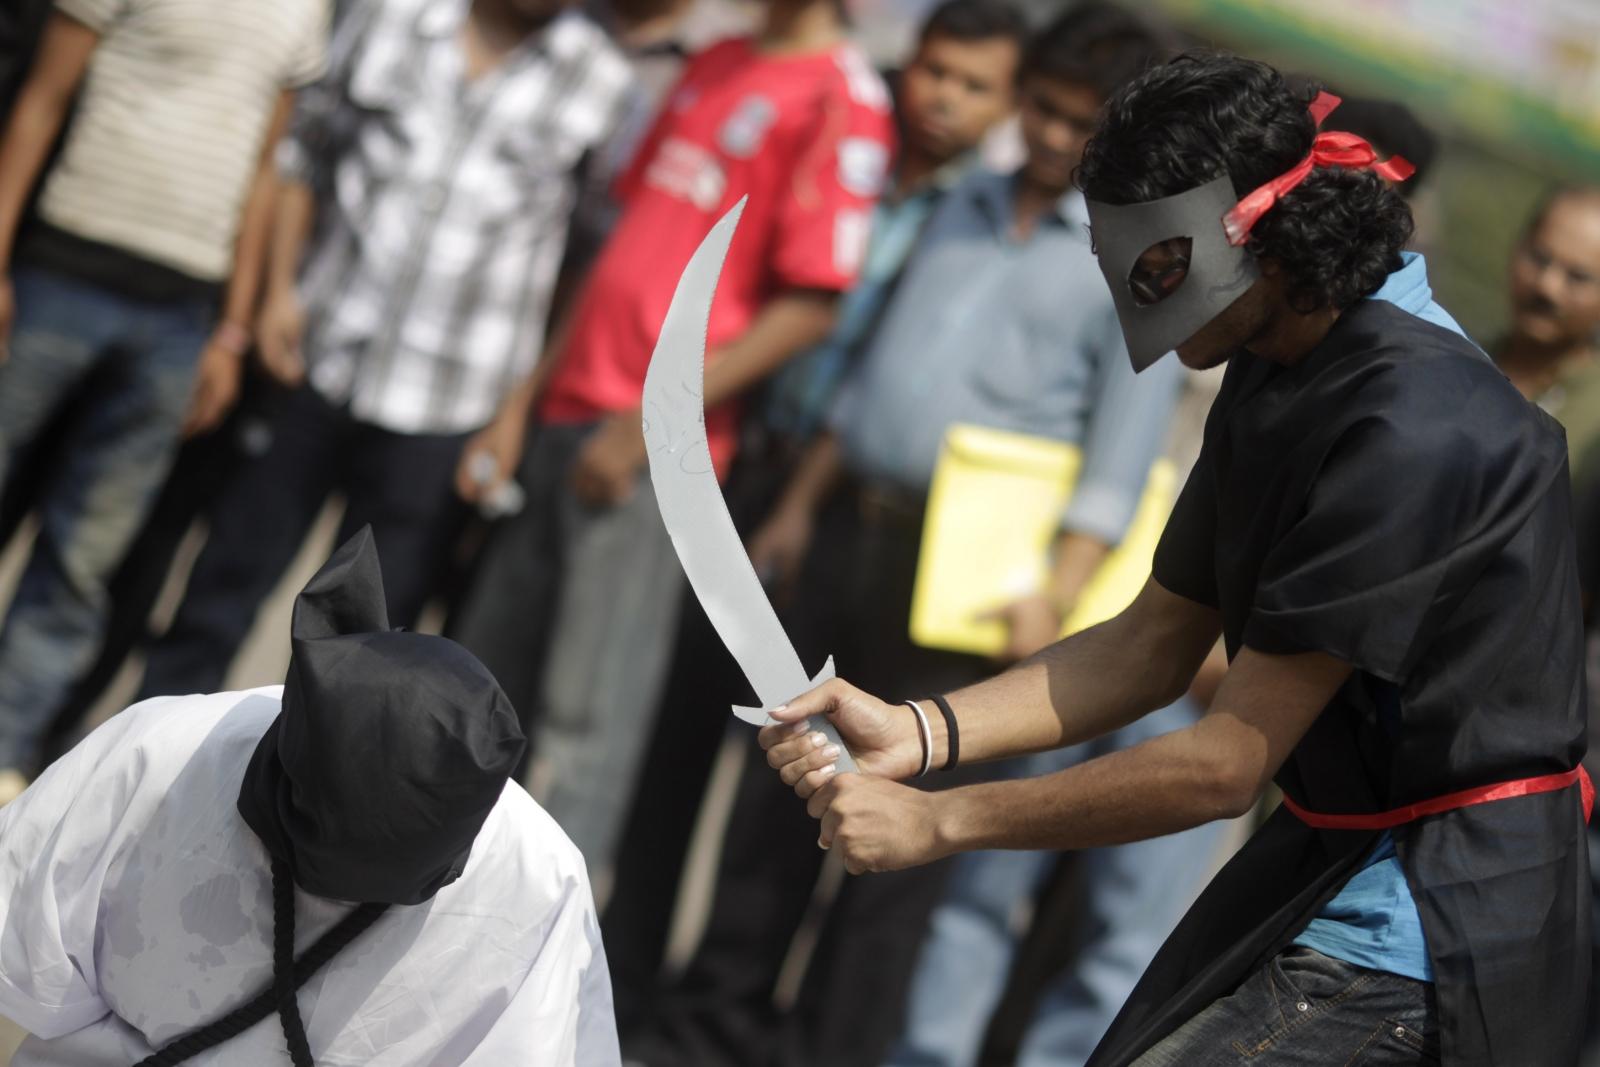 Saudi Arabia executioners